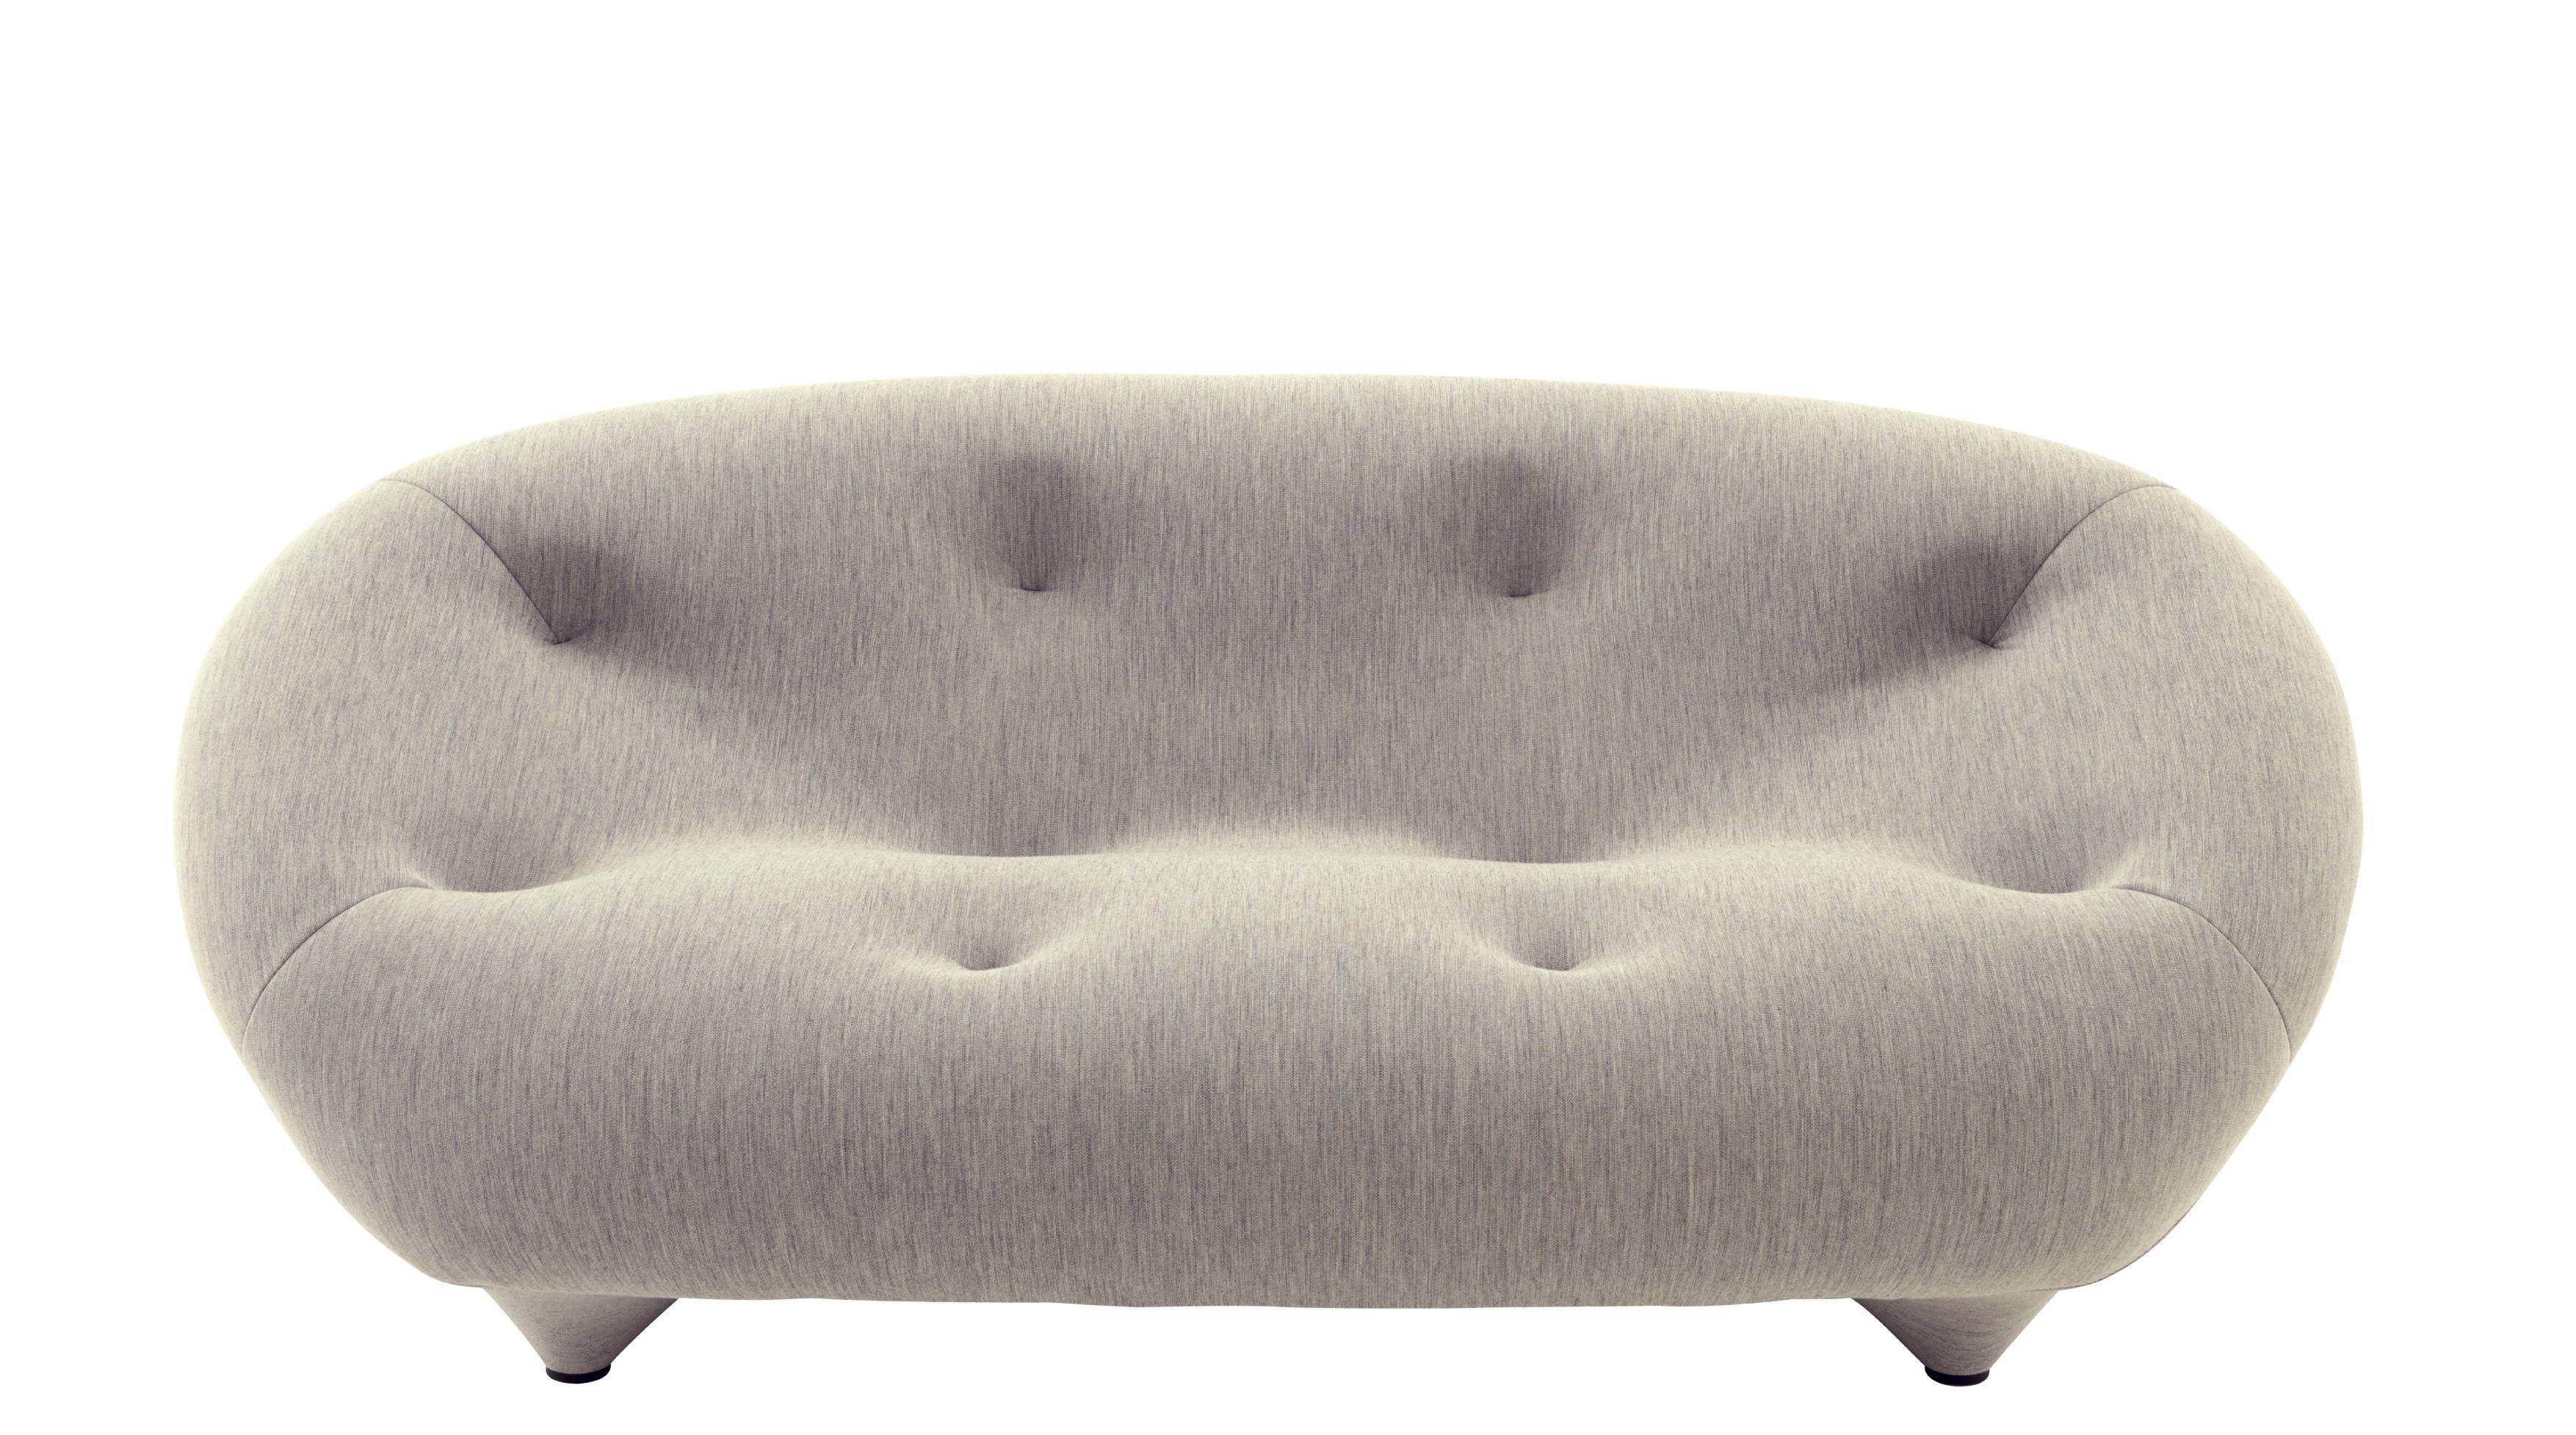 Upholstered Fabric Sofa Ploum Ploum Collection By Roset Italia